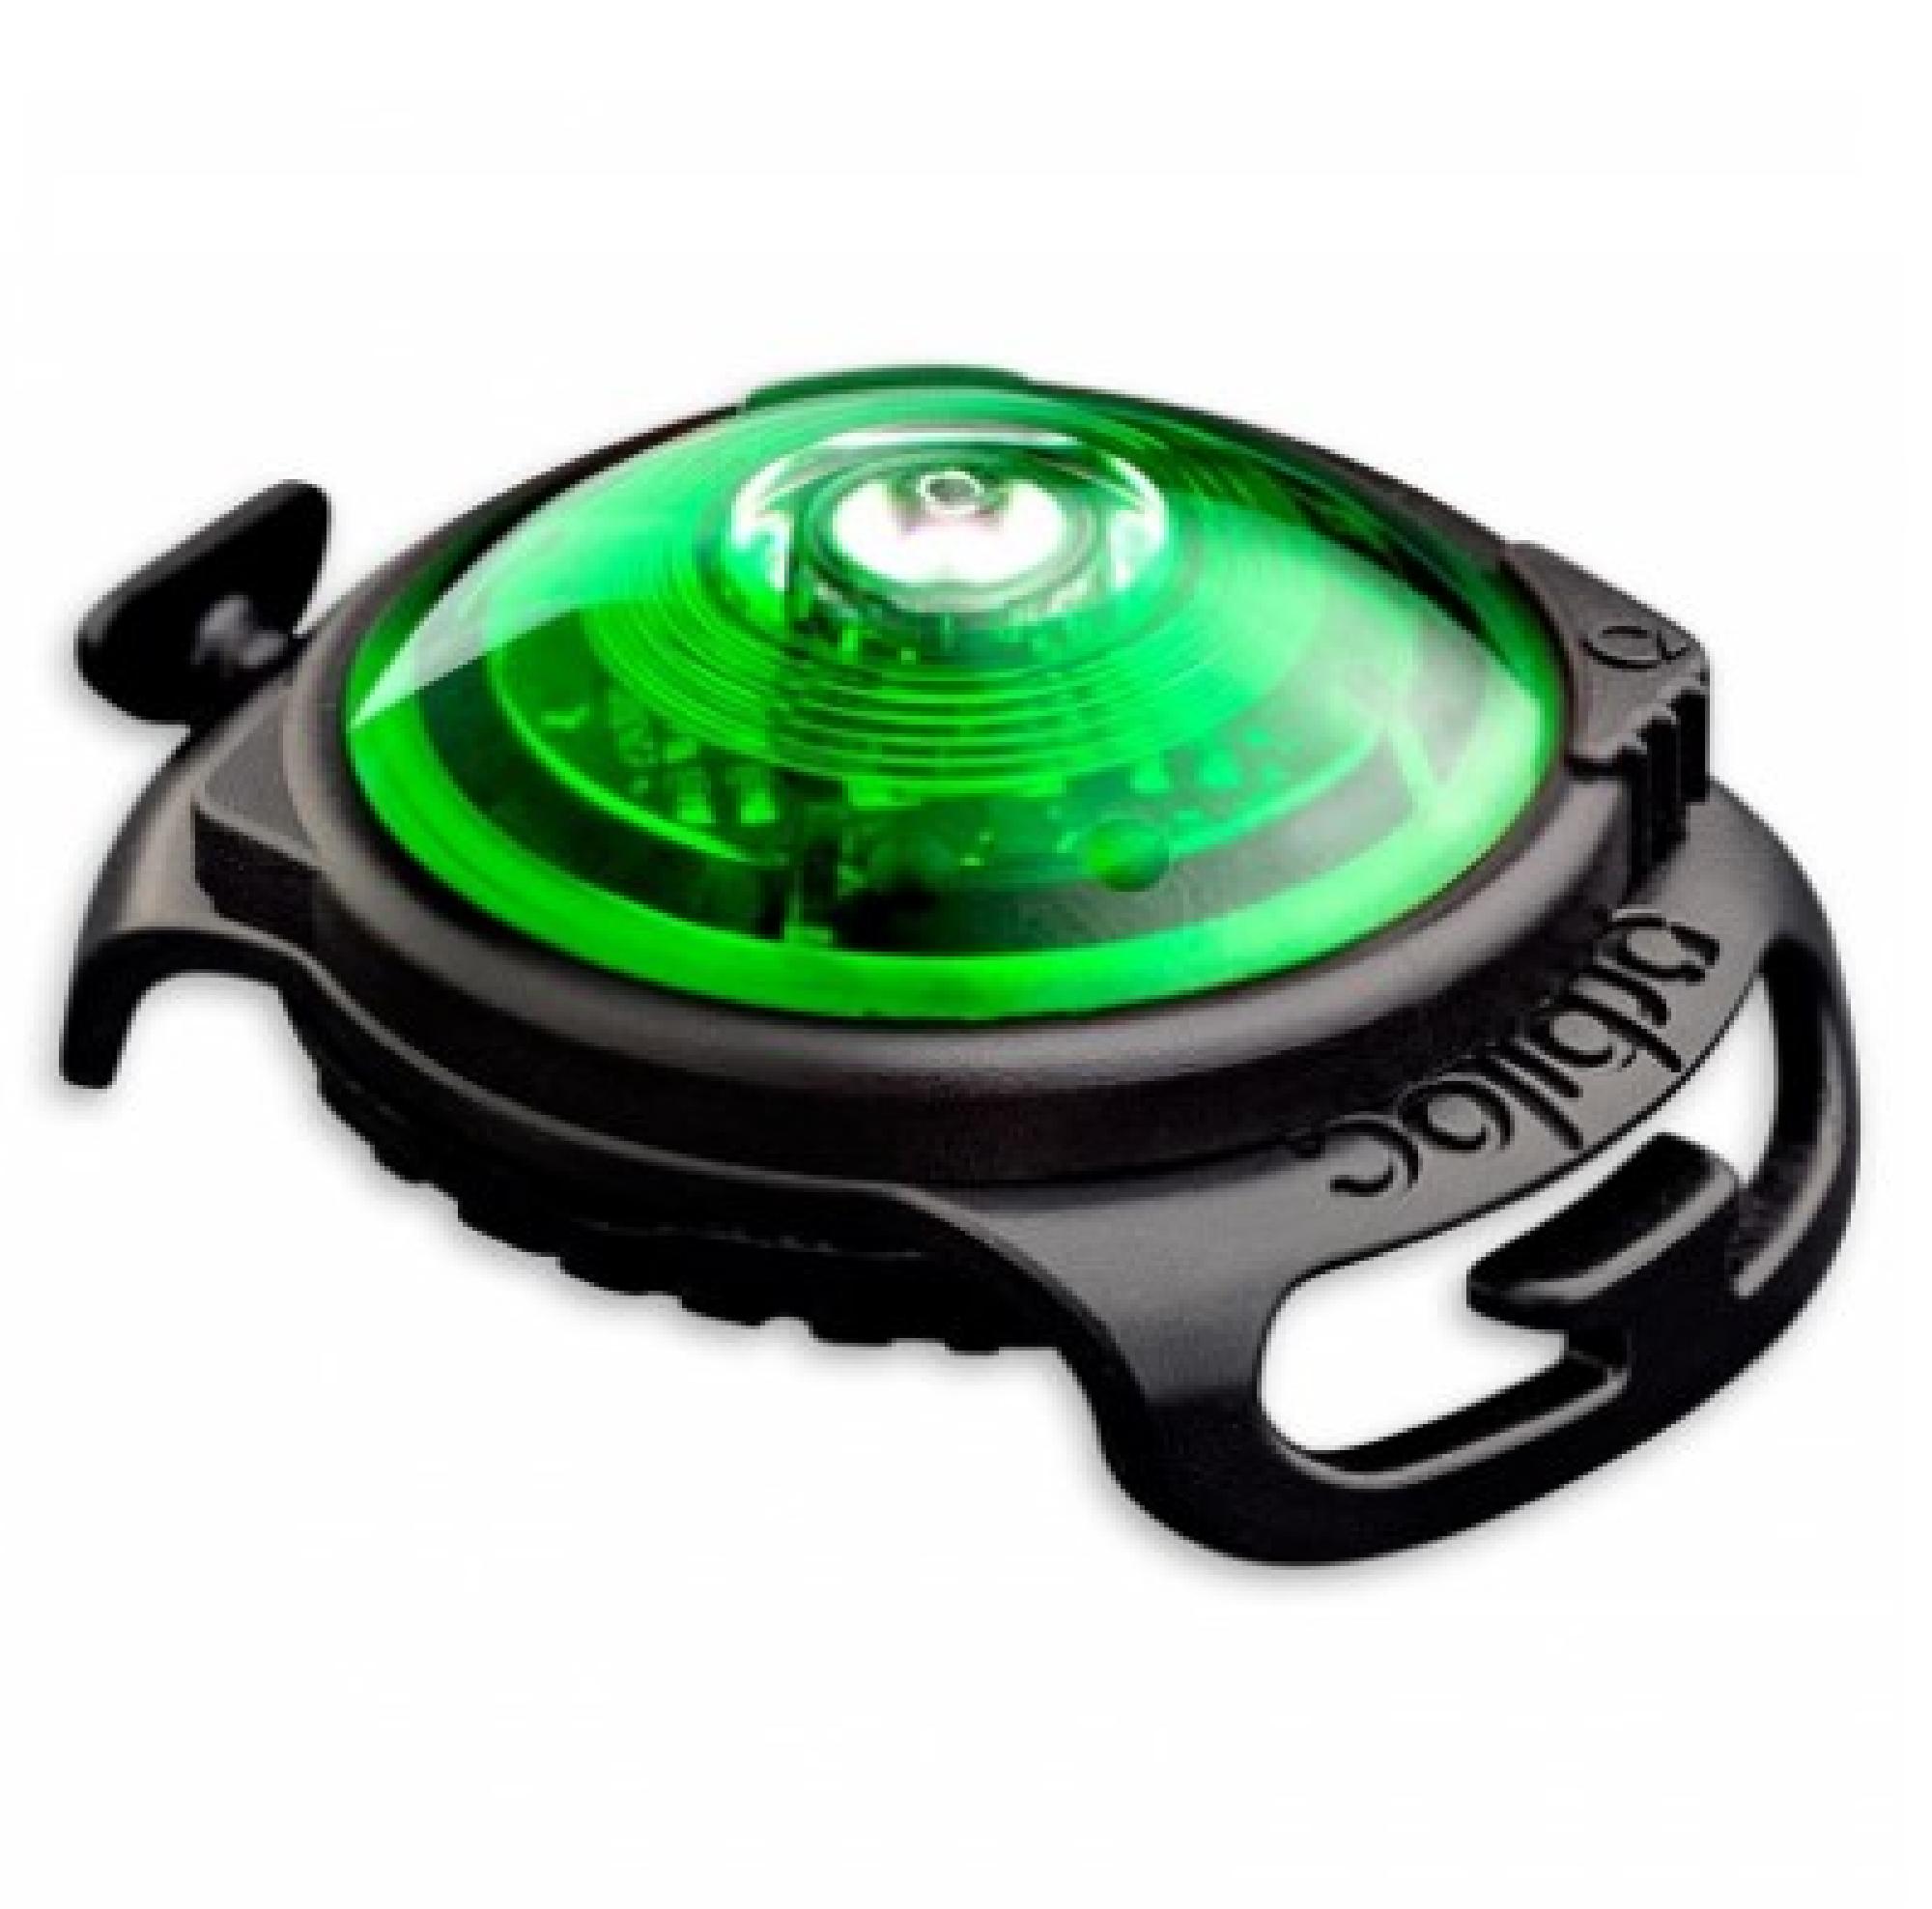 Orbiloc Dual Säkerhetslampa